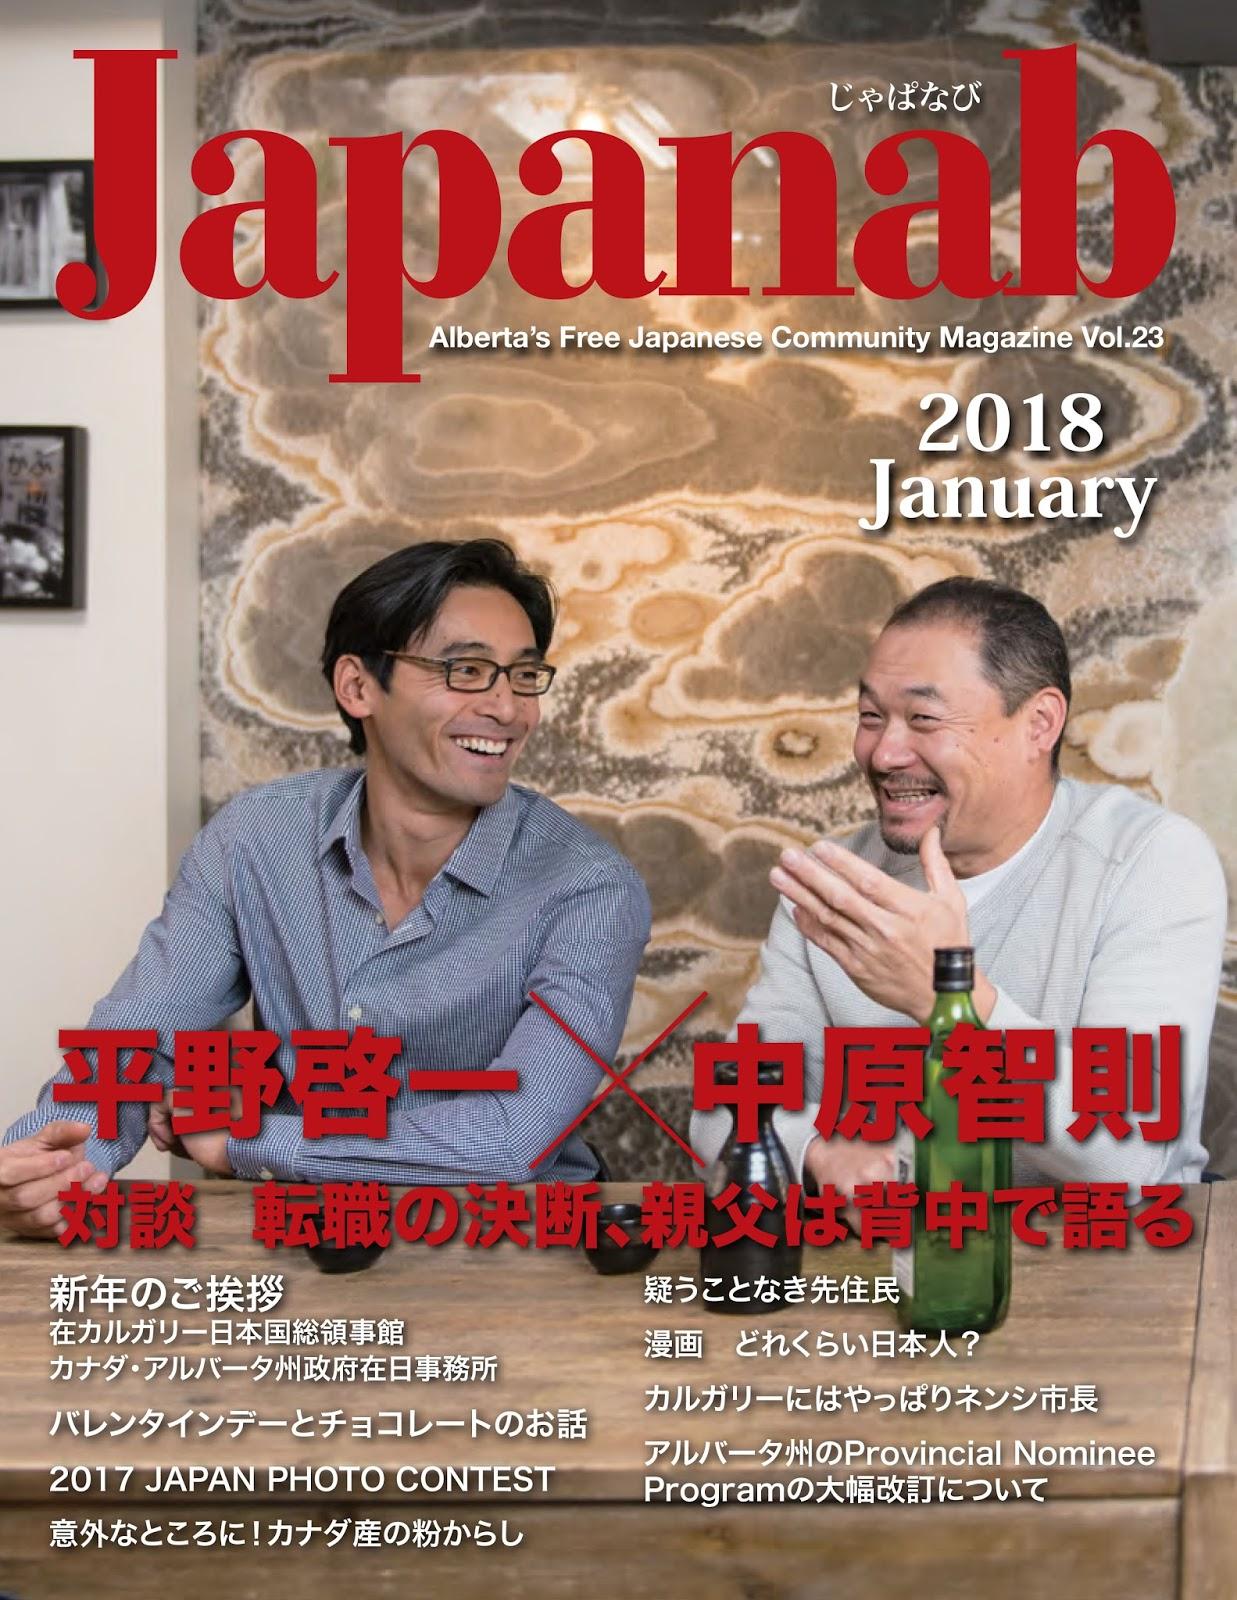 Japanab Vol. 23 - 2018 January